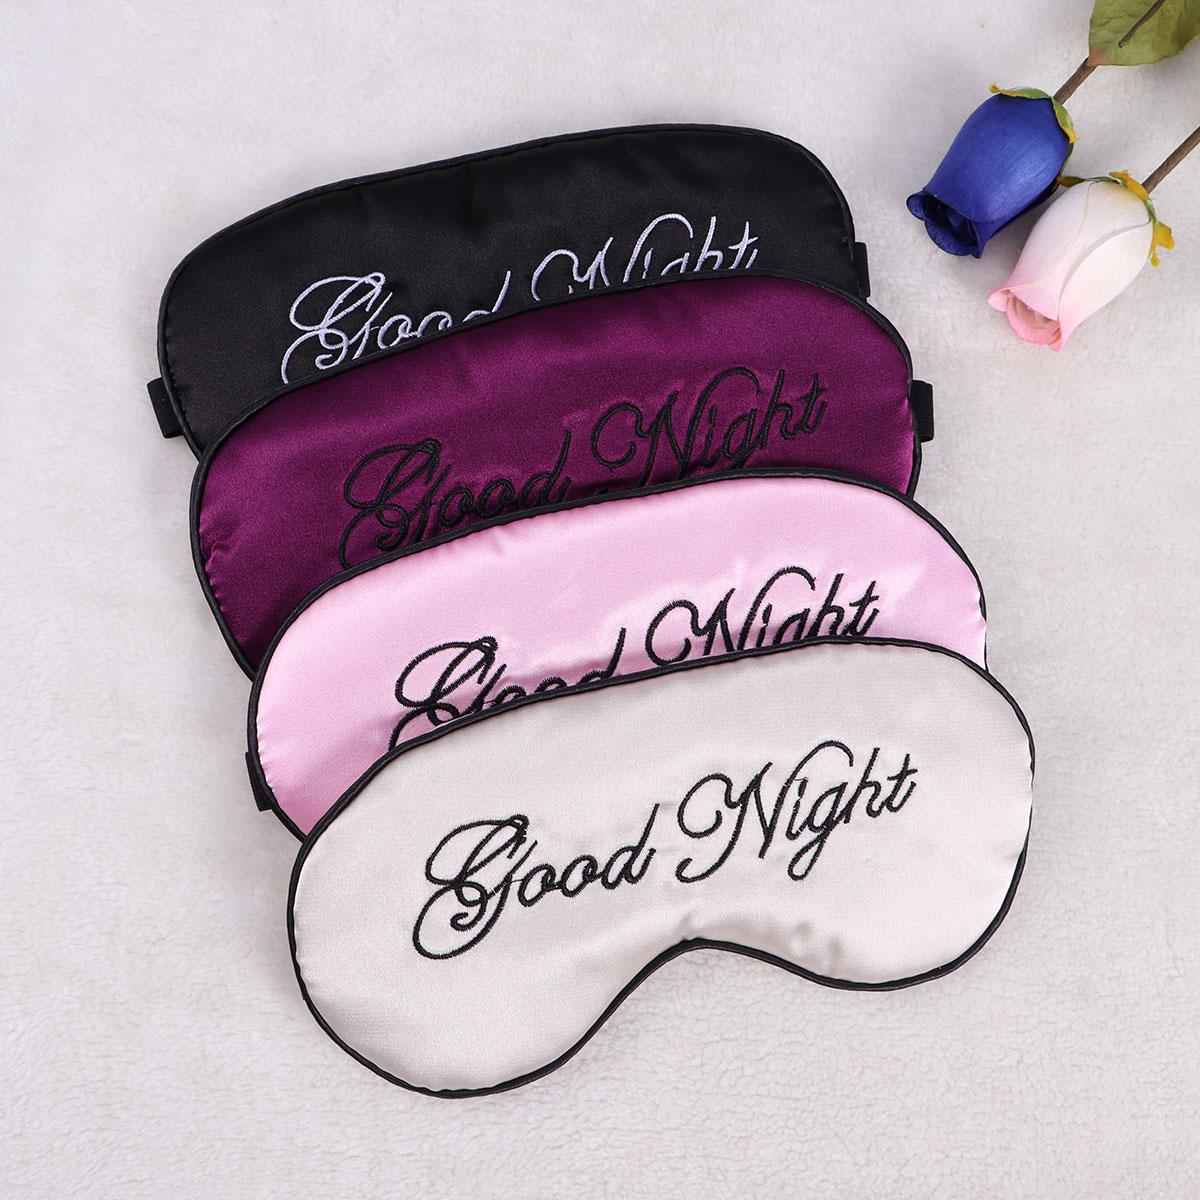 Silk Sleep Eye Mask Embroidery Eyeshade Large Blindfold Night Blinder for Men Women and Kids 4